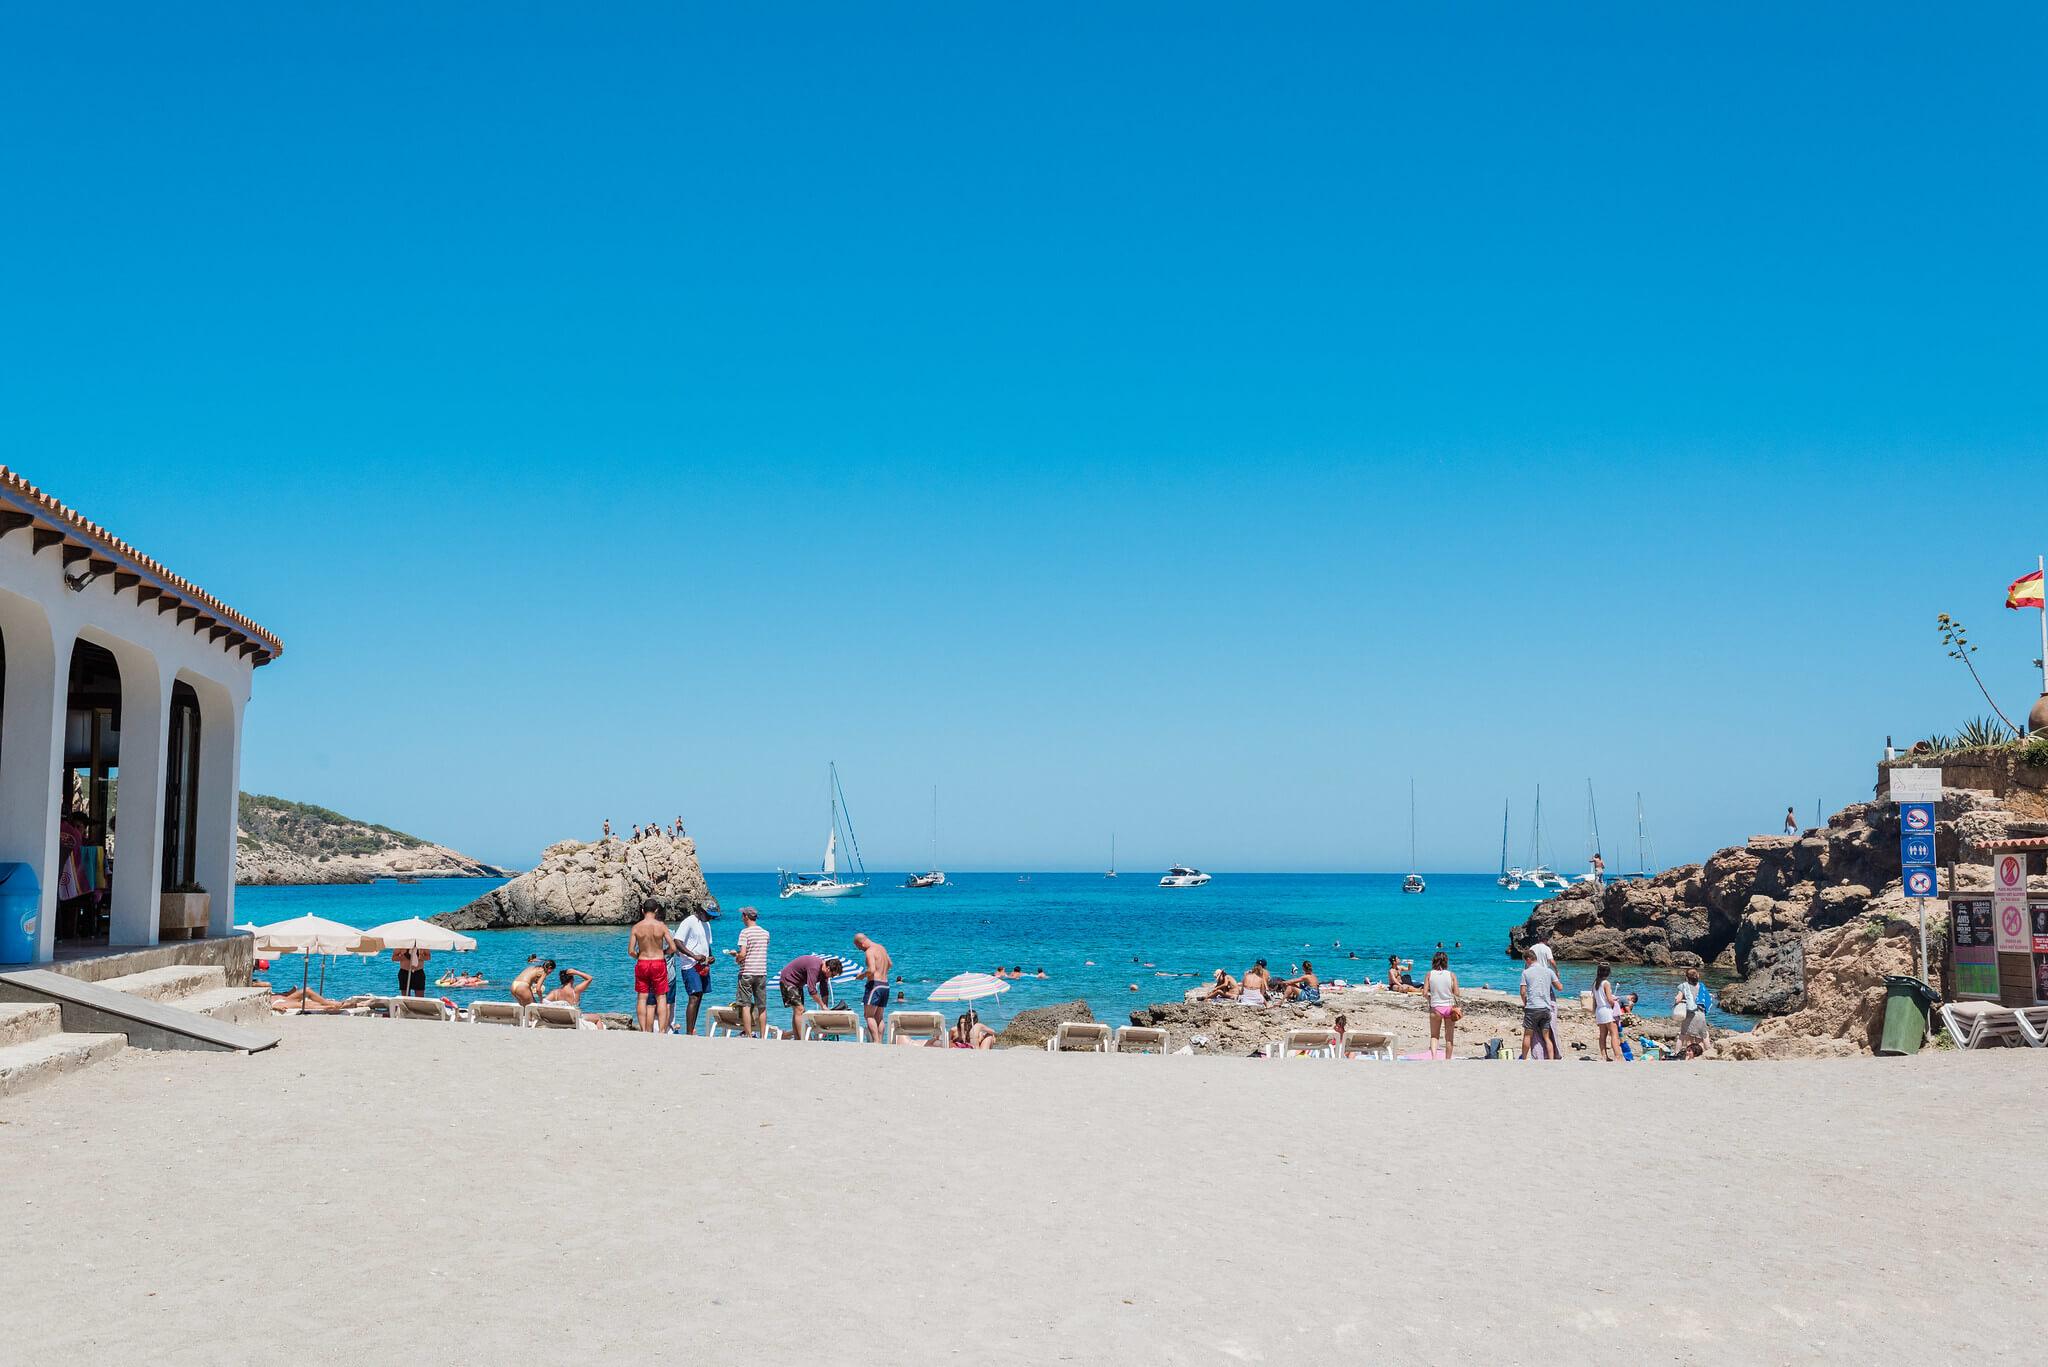 https://www.white-ibiza.com/wp-content/uploads/2020/03/ibiza-beaches-cala-xaracca-08.jpg